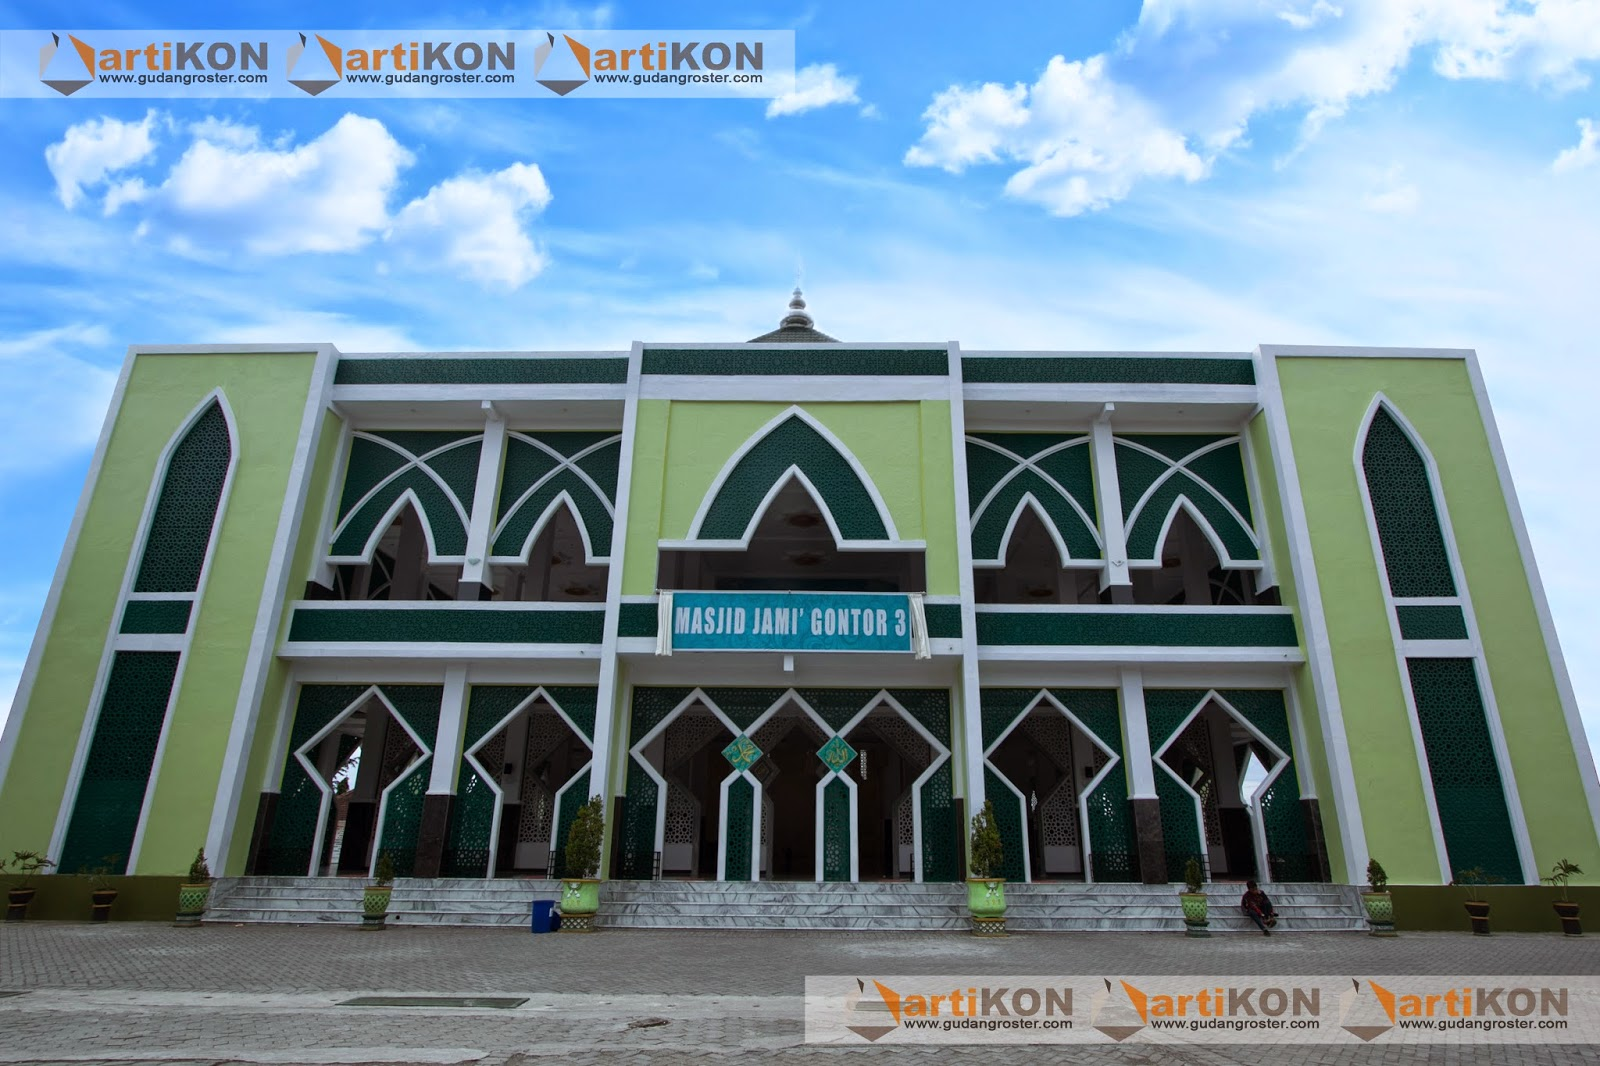 Grc Artikon Kerja Sama Pembangunan Masjid Jami Gontor 3 Desa